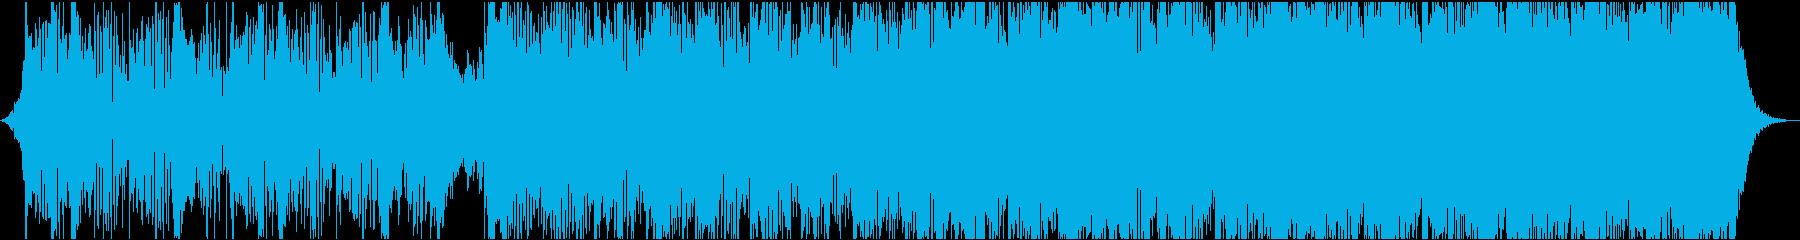 Adventure musicの再生済みの波形